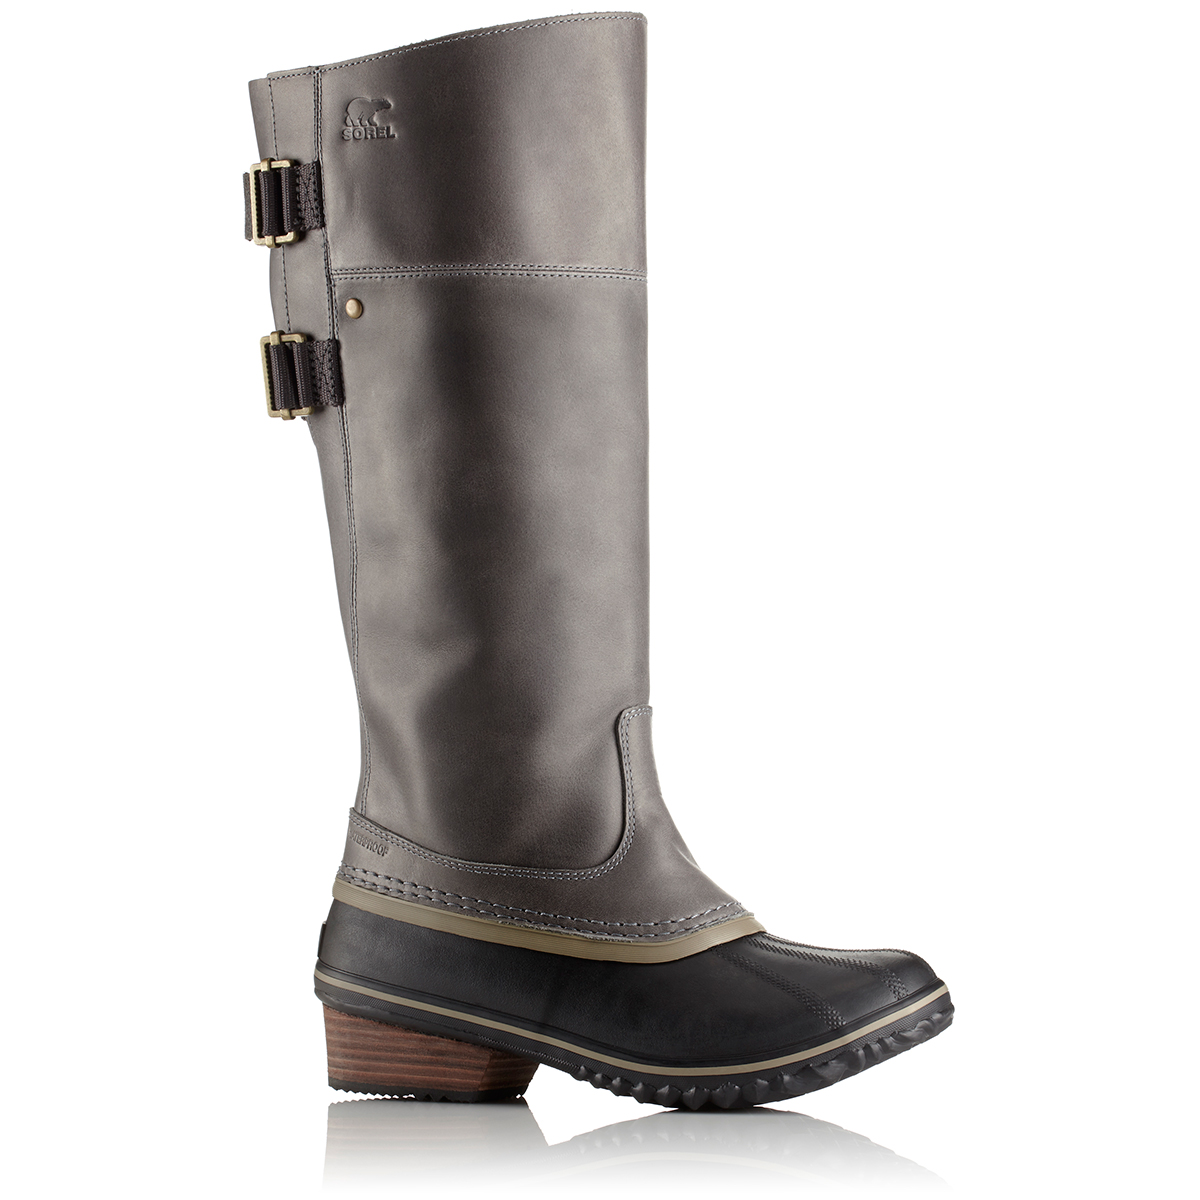 Sorel Women's Slimpack Riding Tall Ii Waterproof Boots, Quarry/pebble - Black, 7